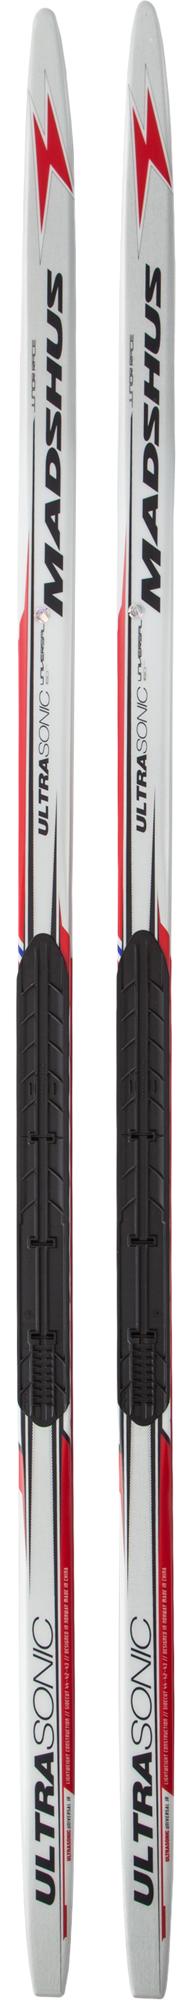 Madshus Беговые лыжи юниорские Madshus Ultrasonic Universal Jr беговые лыжи tisa race cap universal jr n90212